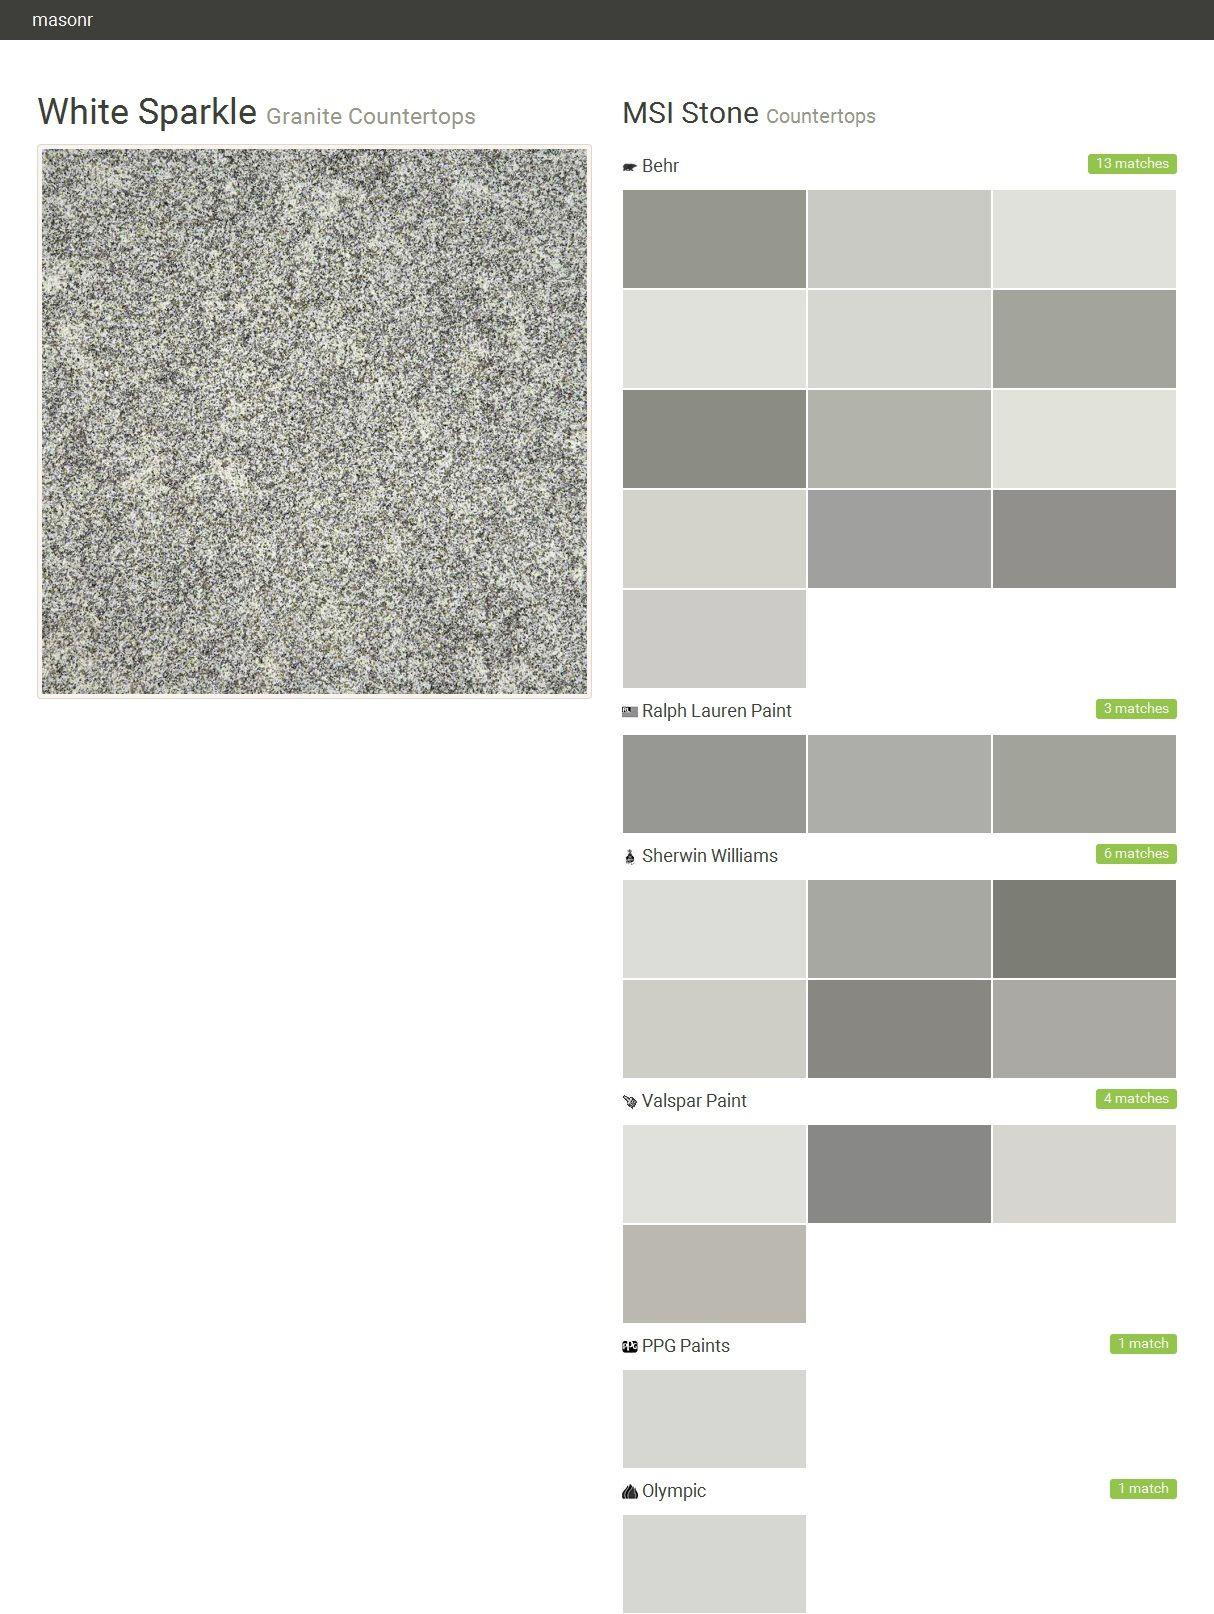 White sparkle granite countertops countertops msi stone for Valspar paint colors